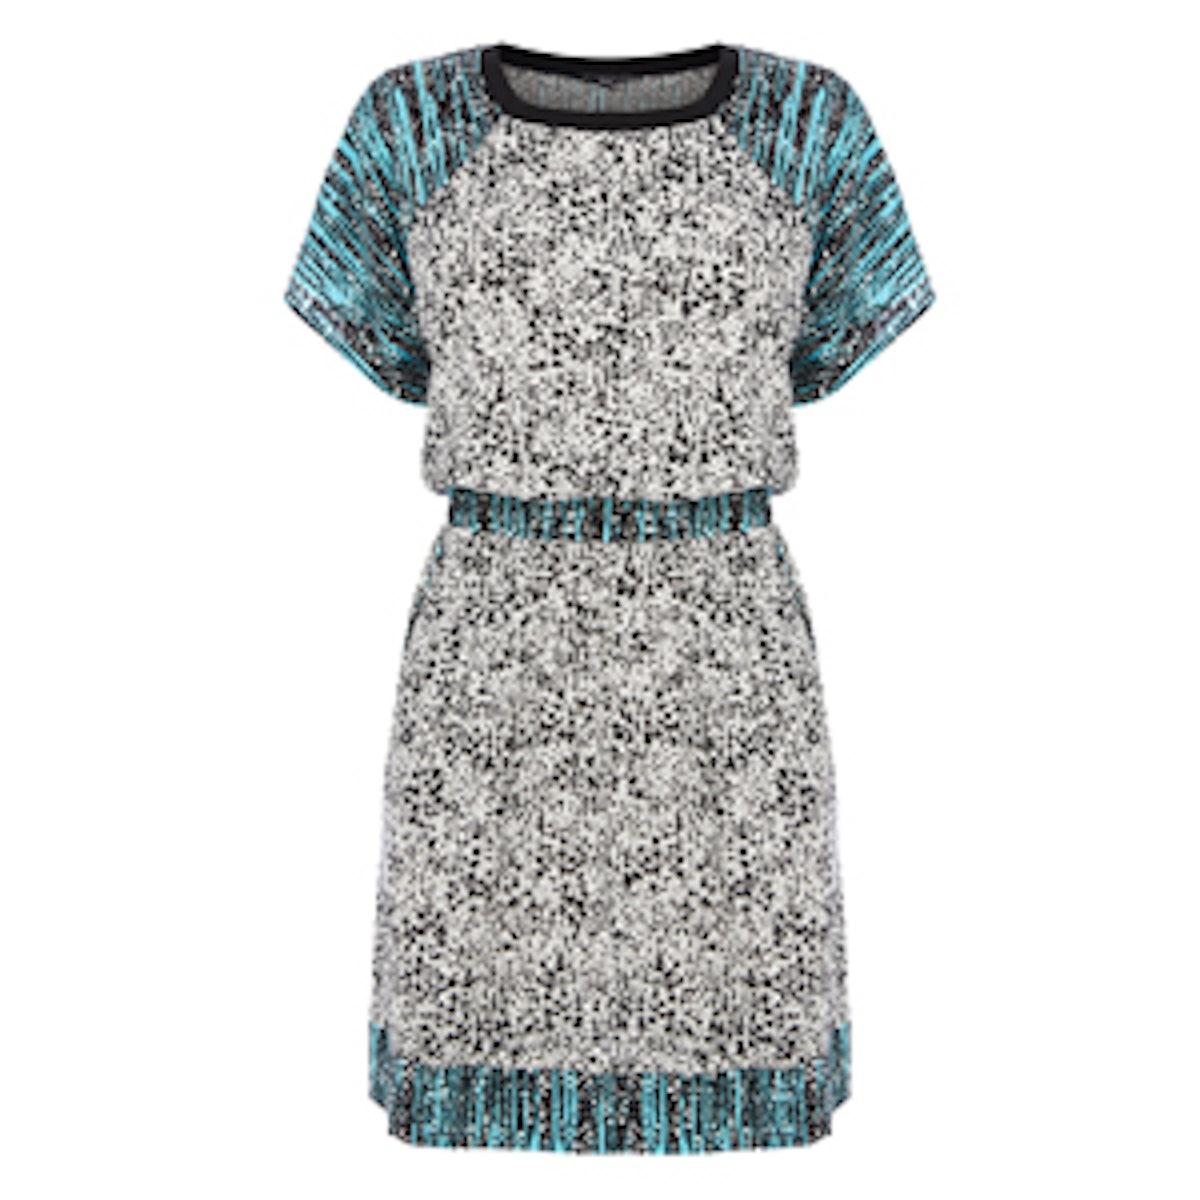 Printed Drawstring Dress